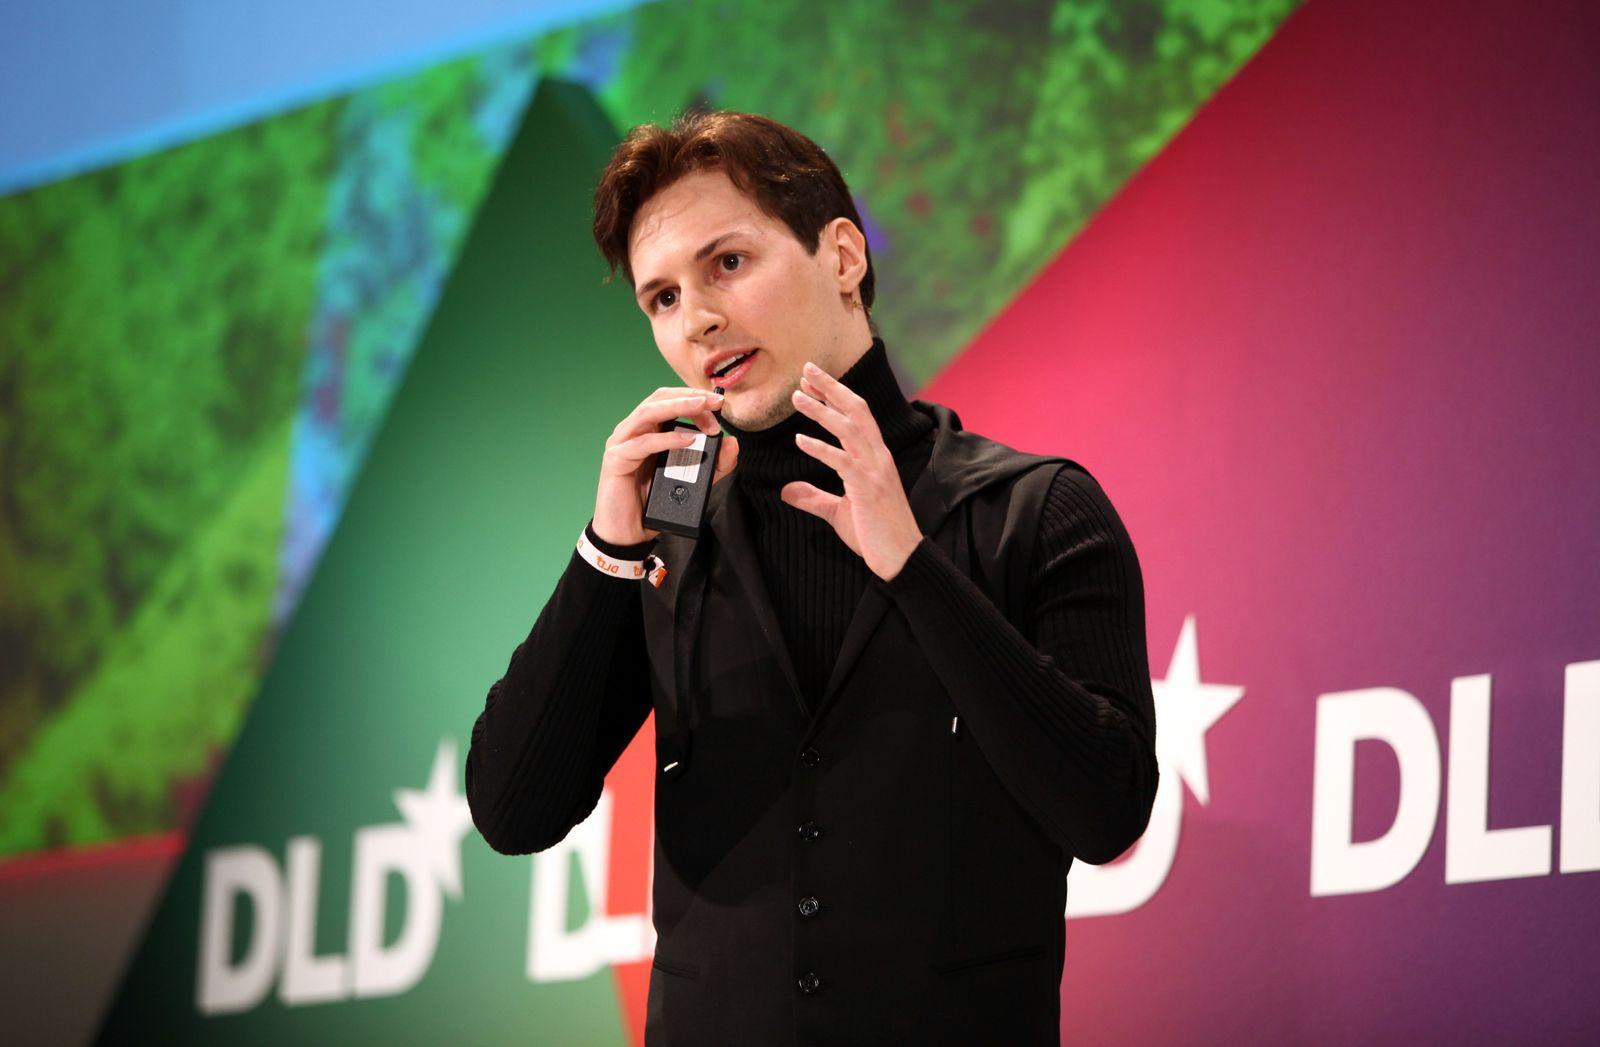 DLD Conference 2012 - Day 3 / Pavel Durow / VKontakte